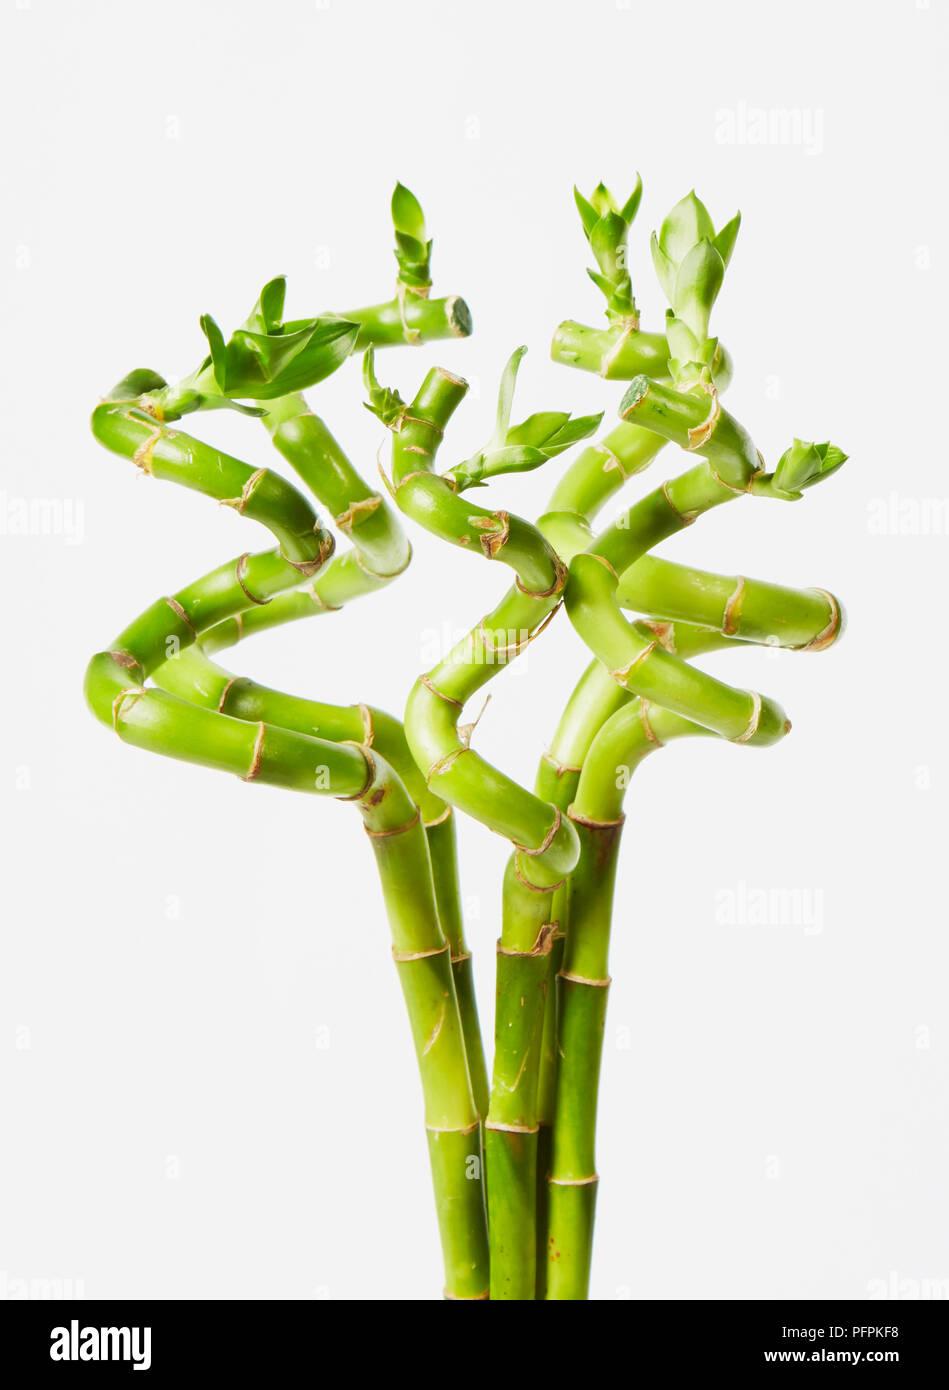 Bambus Pflanze Stockfoto Bild 216242524 Alamy